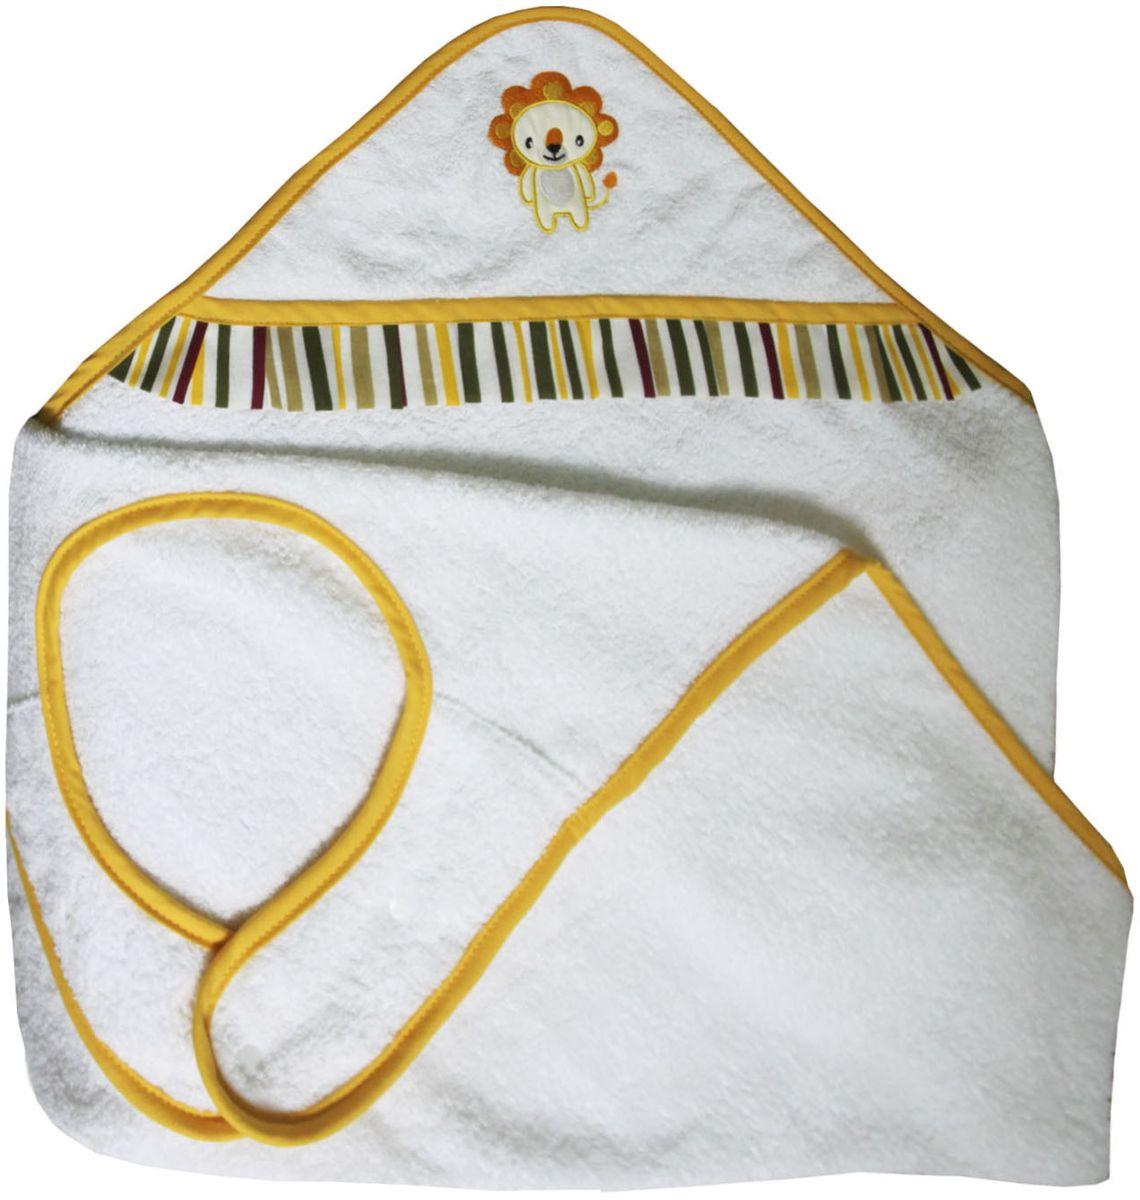 Фартук полотенце для купания